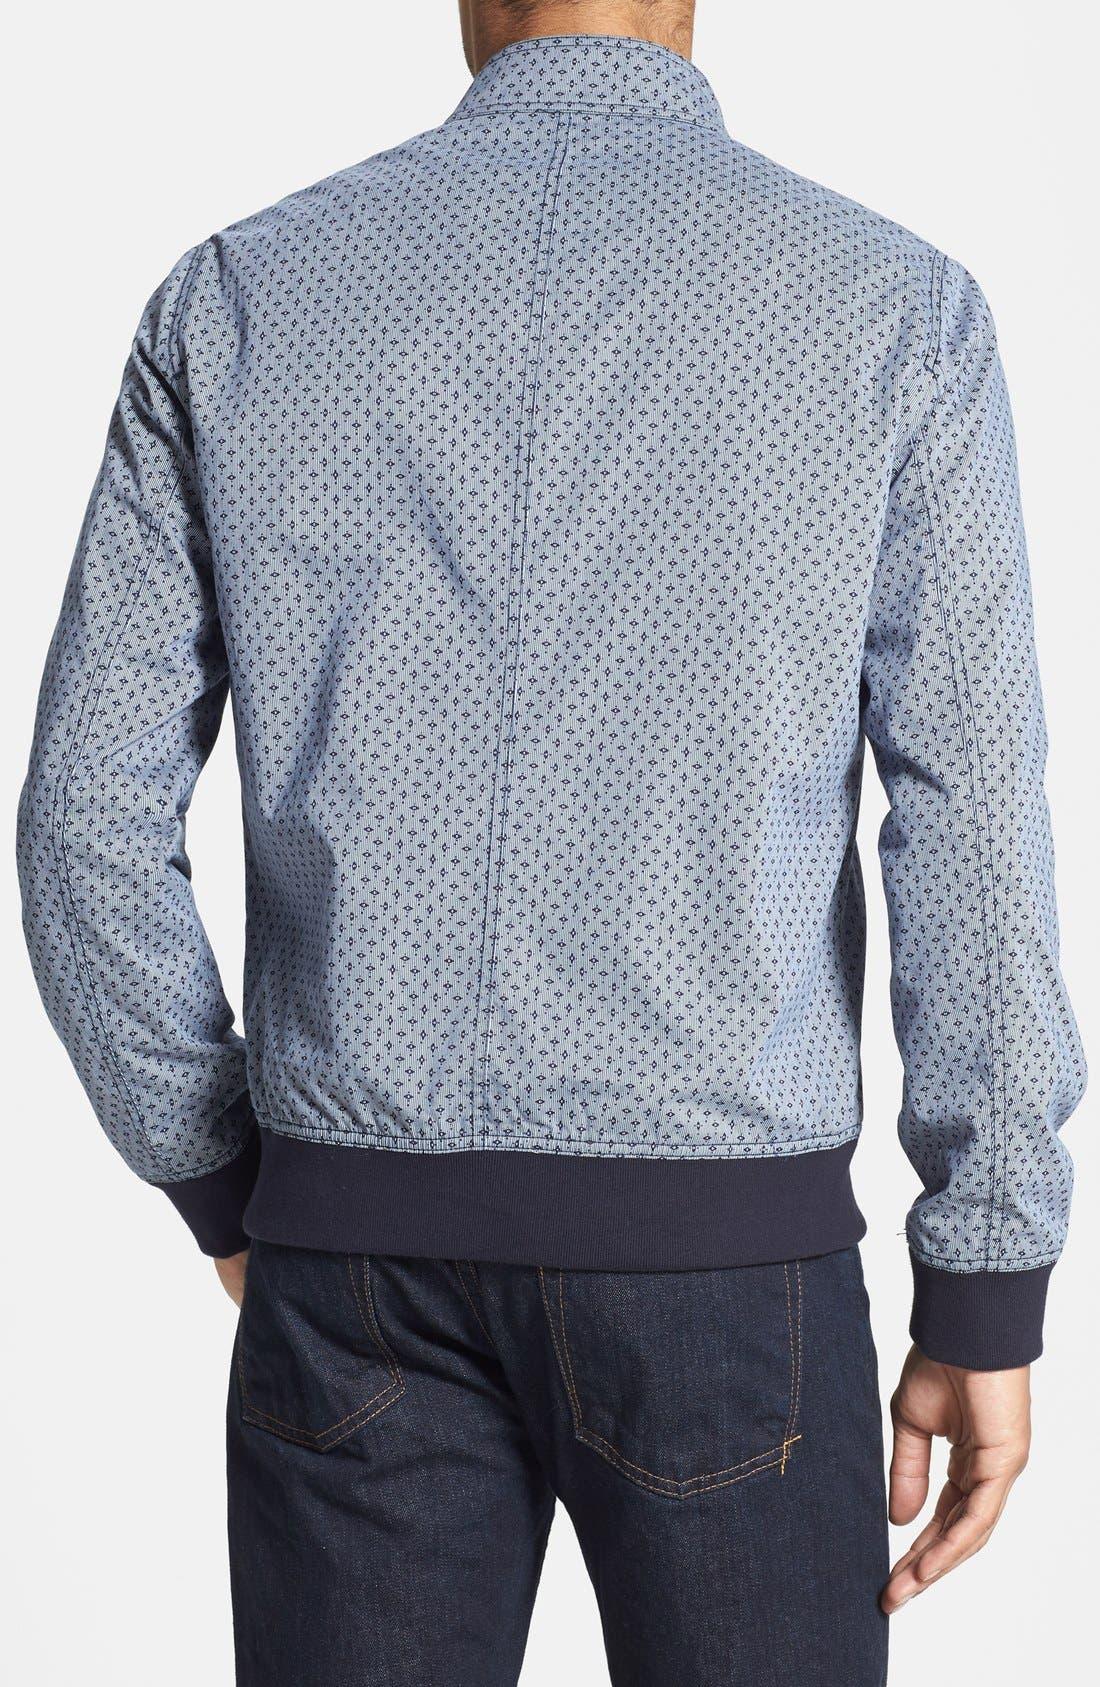 Alternate Image 2  - Ted Baker London 'Lorien' Printed Cotton Bomber Jacket